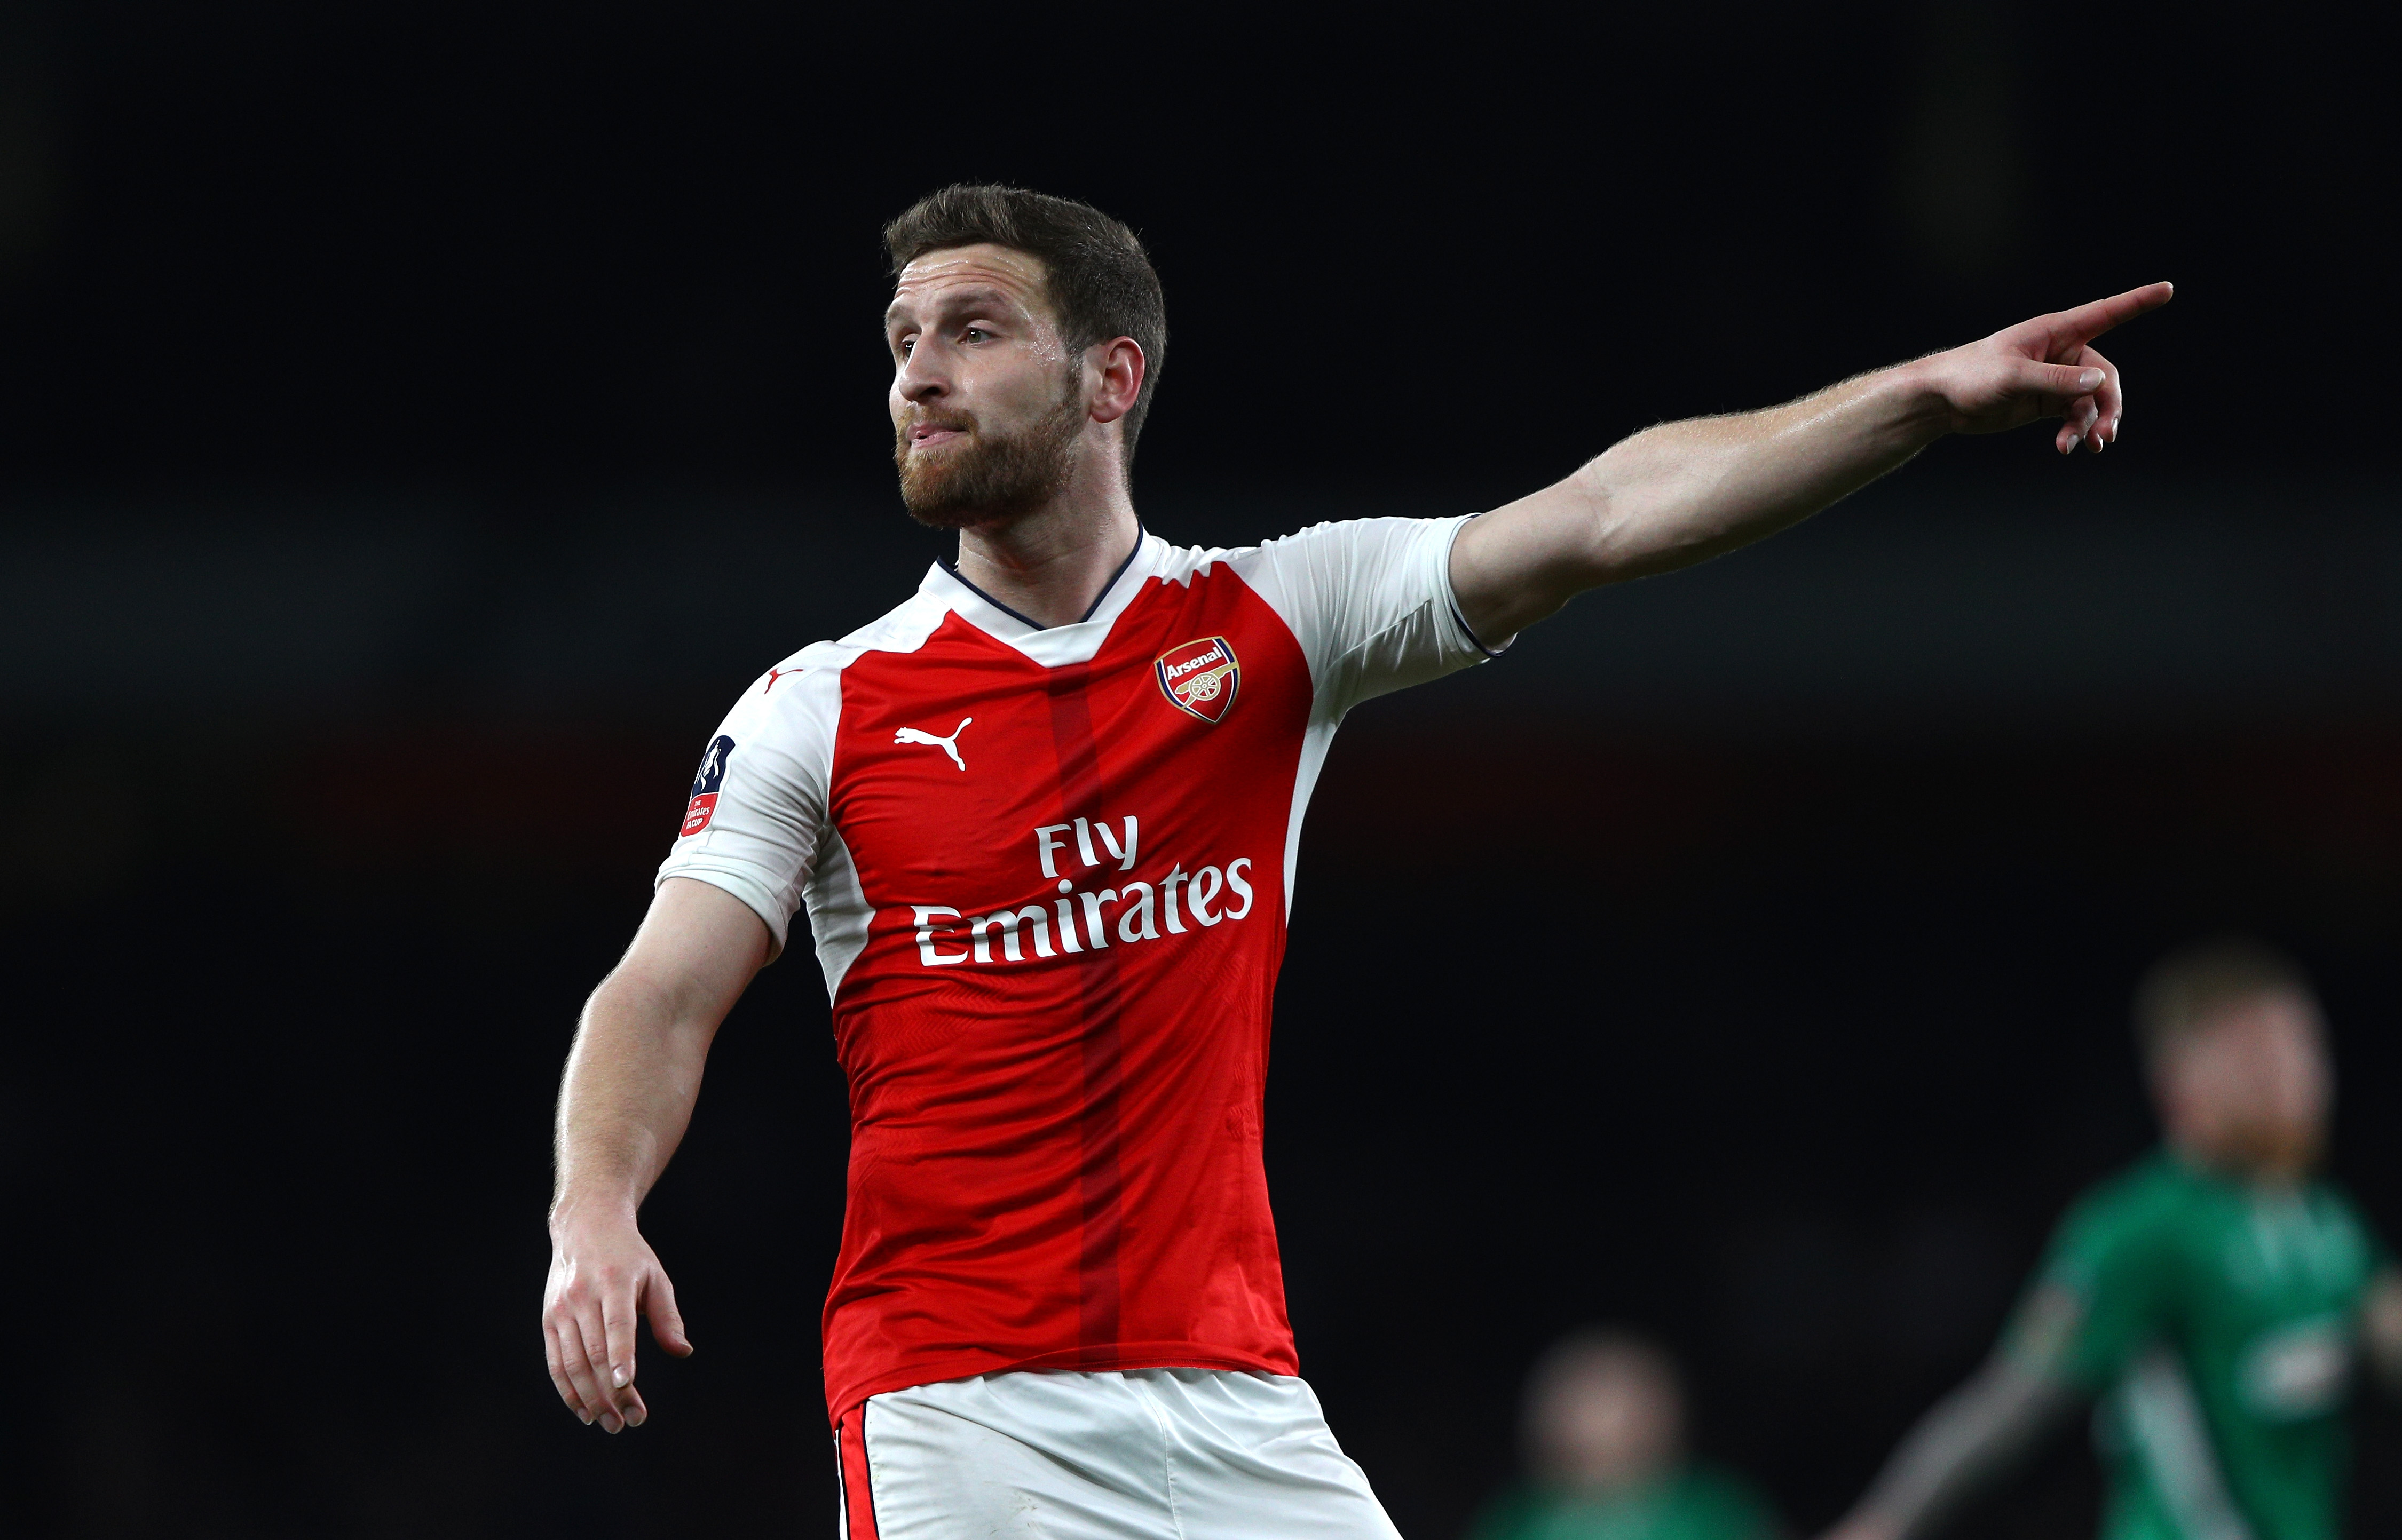 Arsenal 3 things Shkodran Mustafi must improve on next season